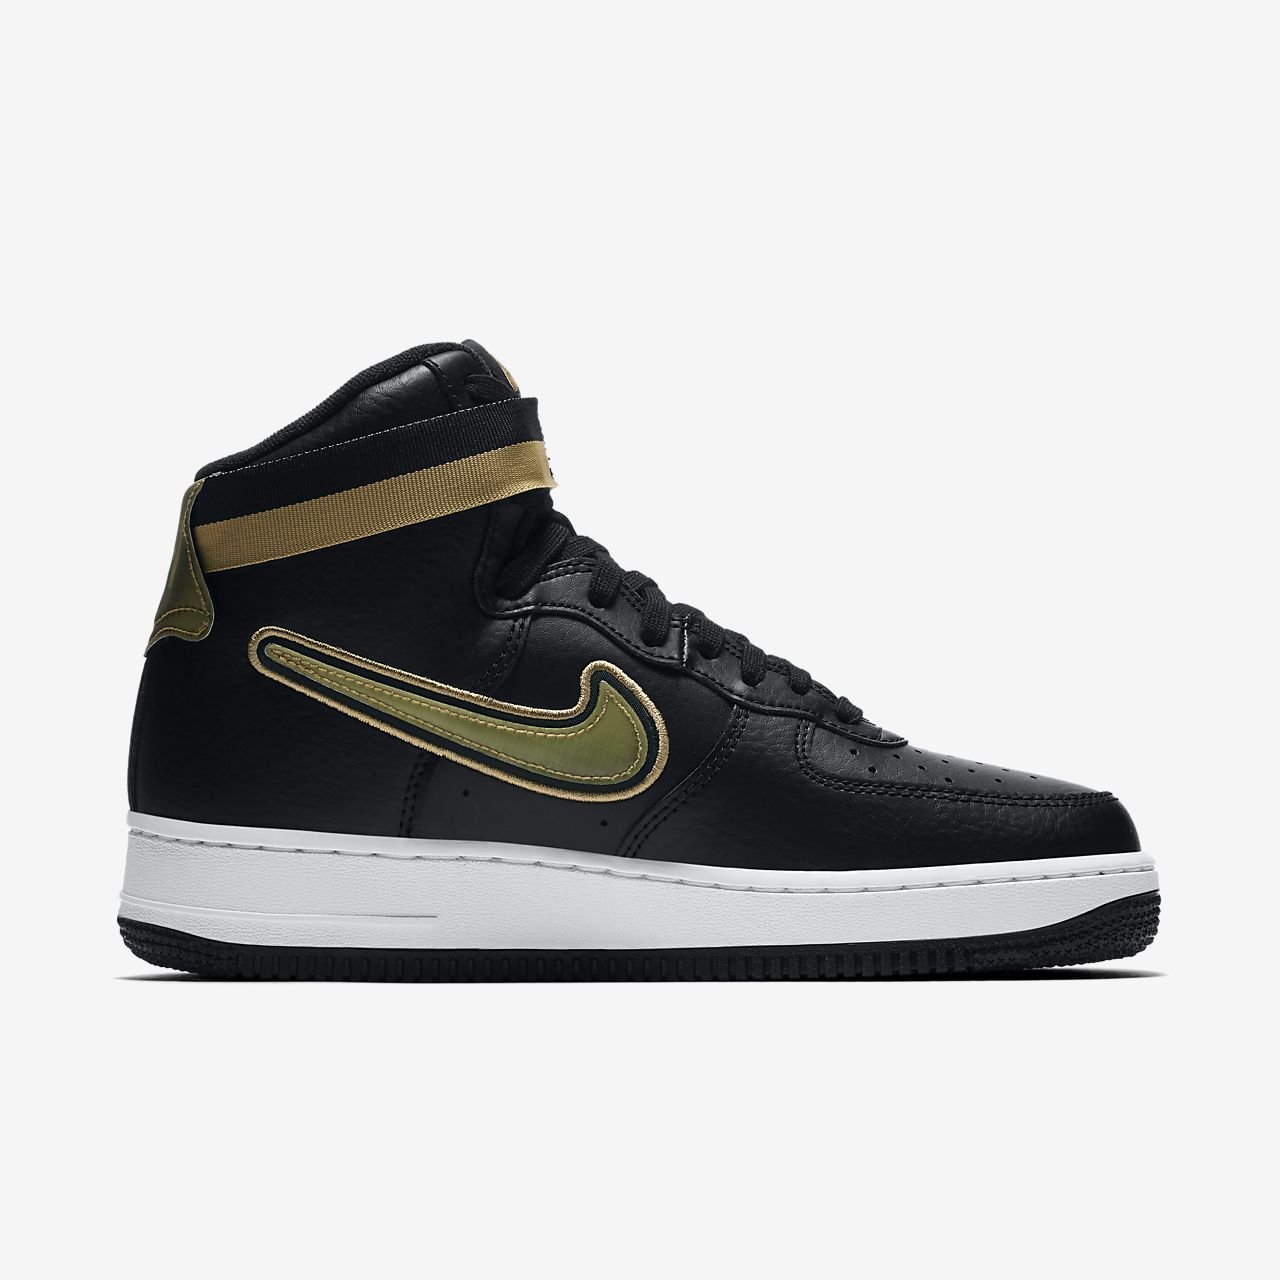 Lv8 Nike Homme Pour High '07 Sport Air Chaussure Nba Force 1 FlKc1J